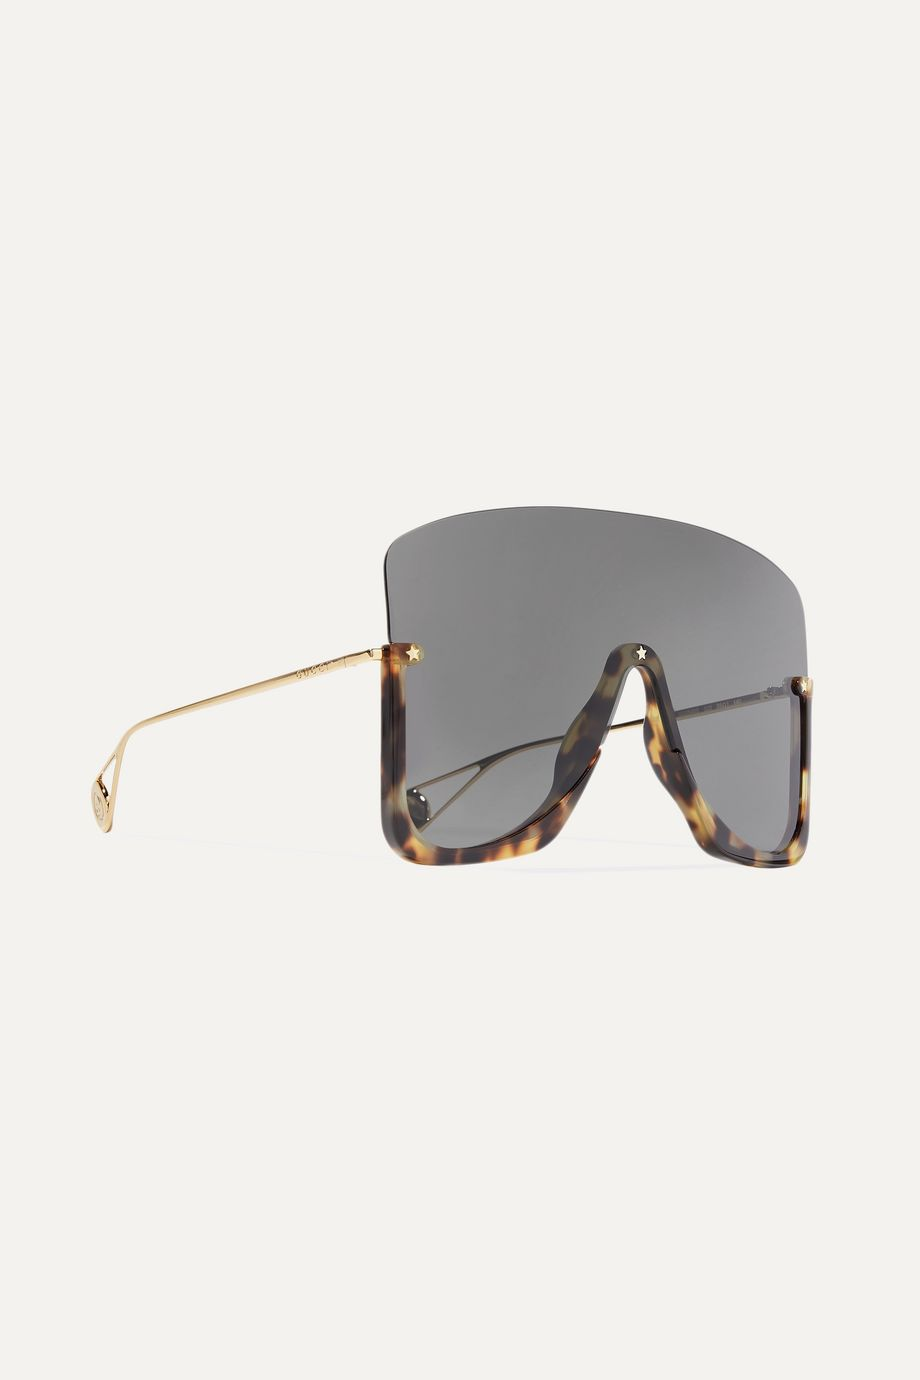 Gucci Visor 板材金色金属方框太阳镜